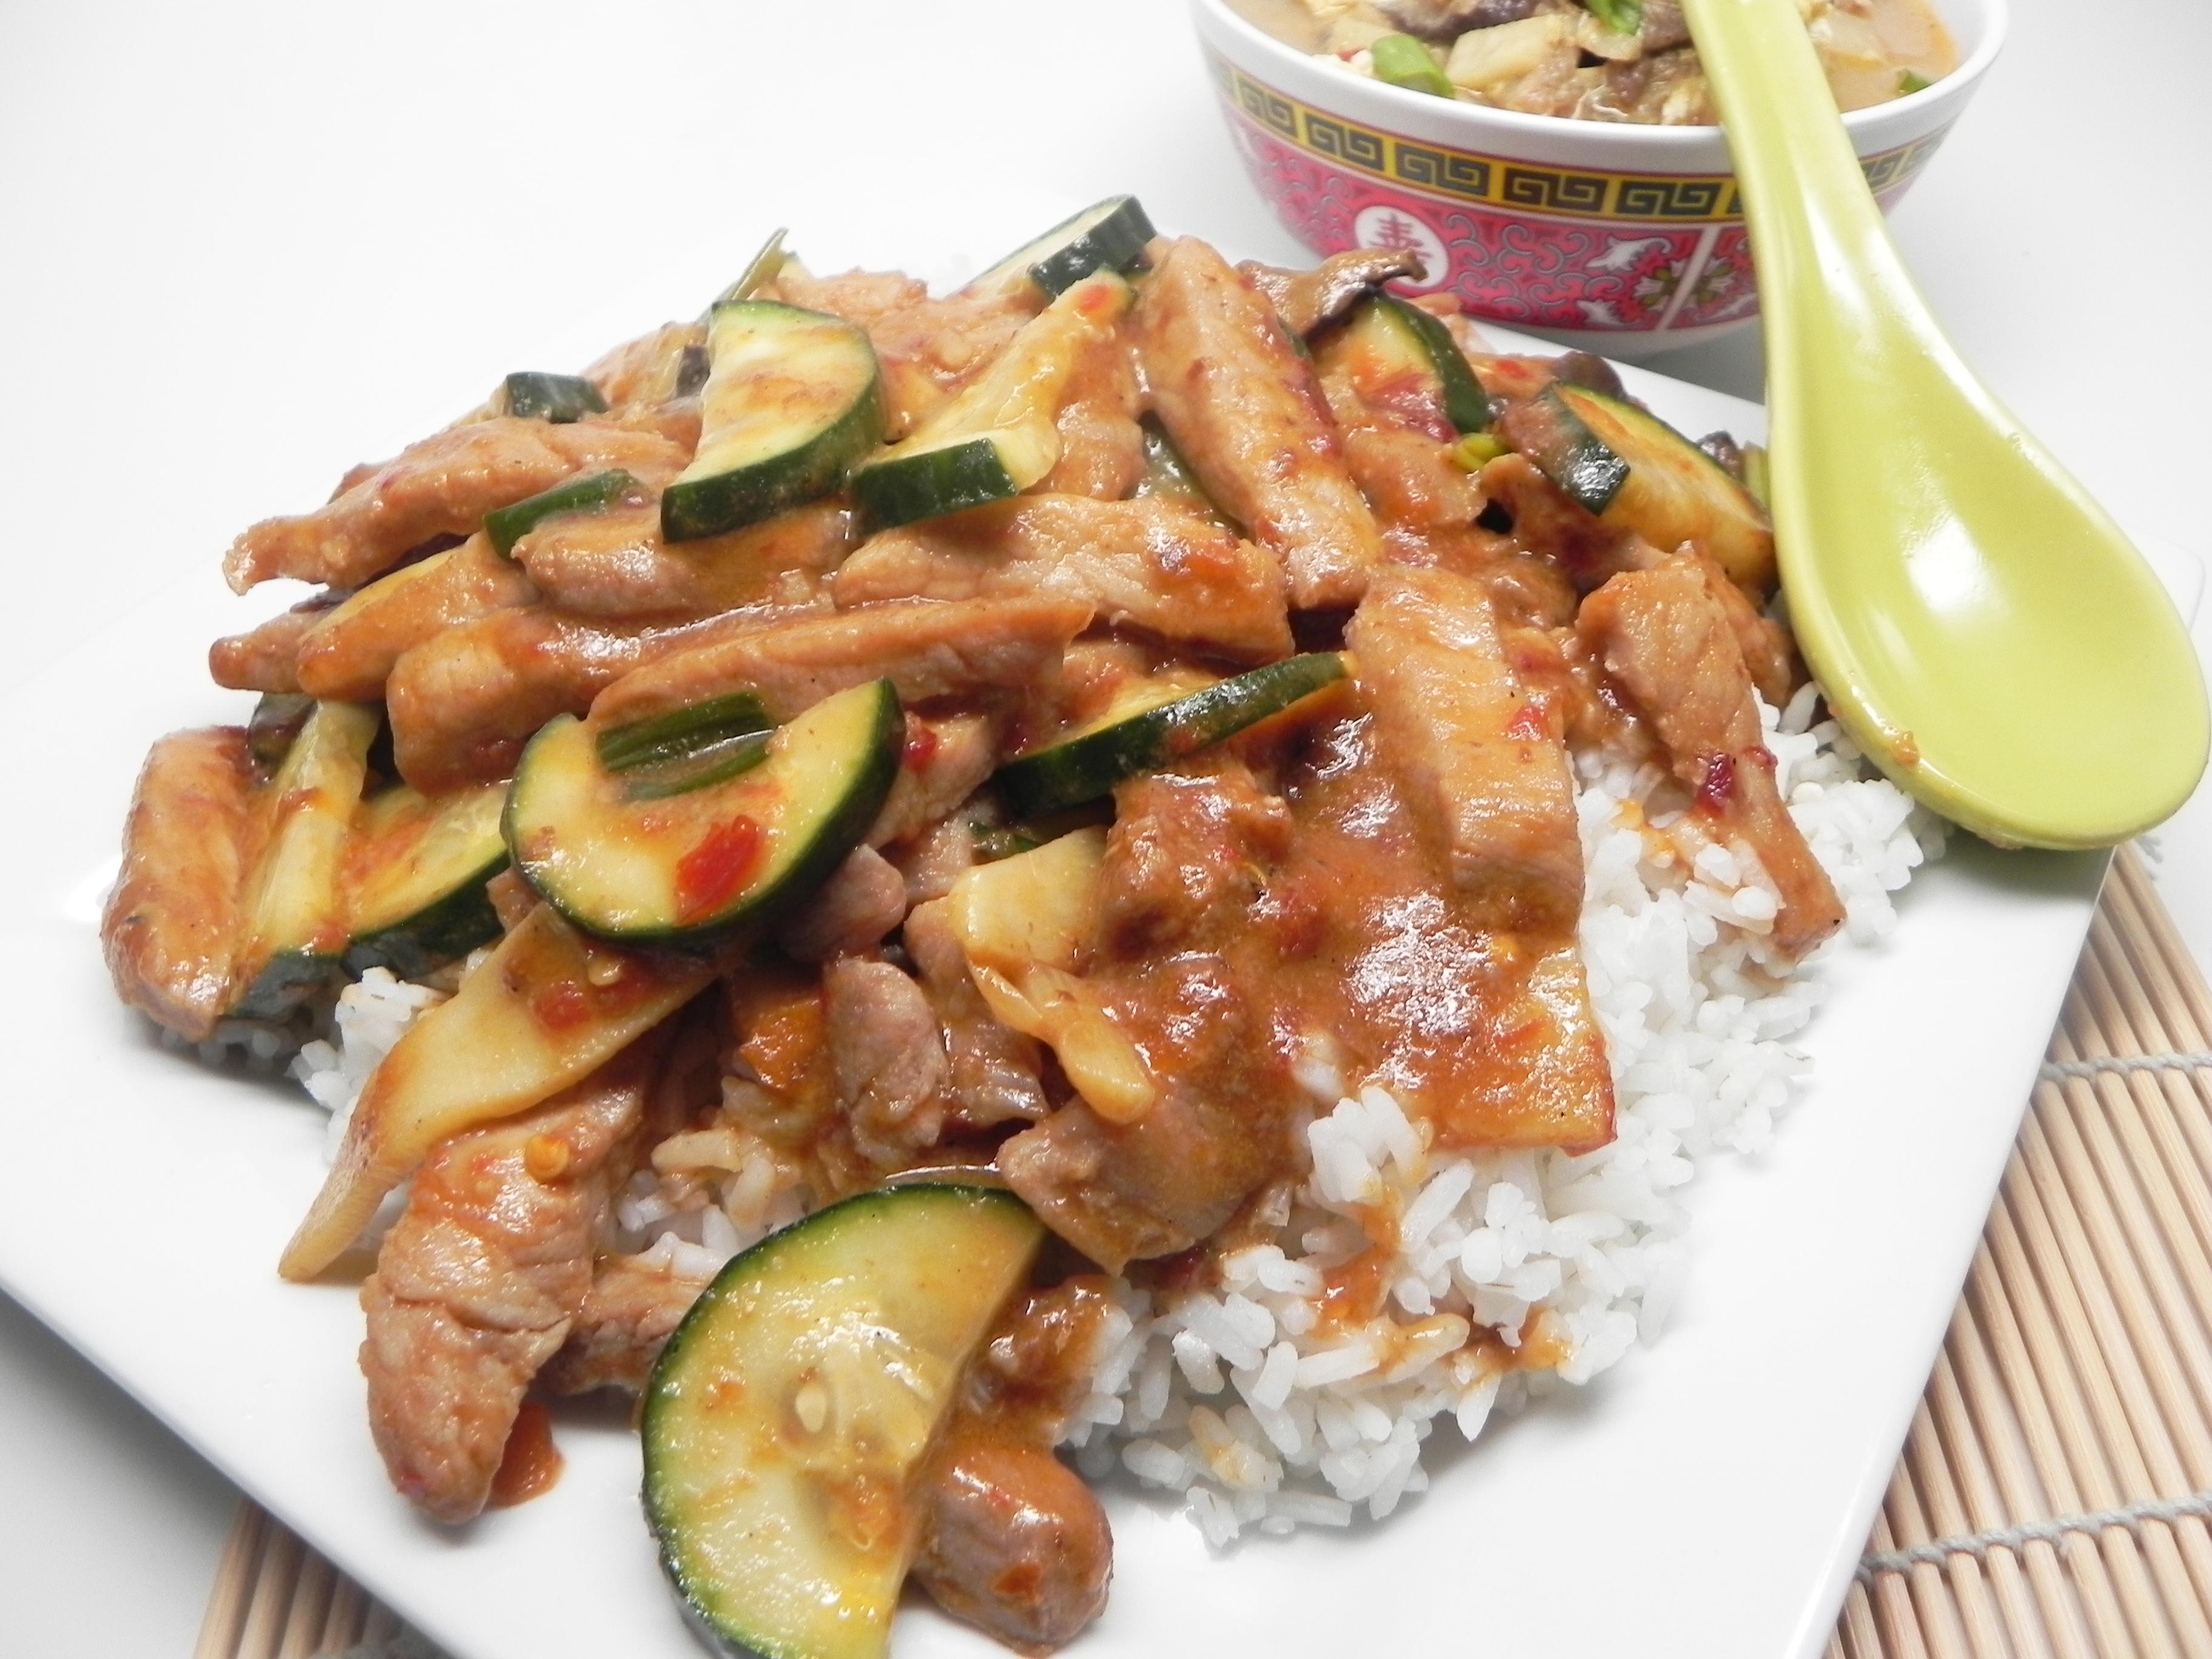 Sichuan Pork Stir-Fry